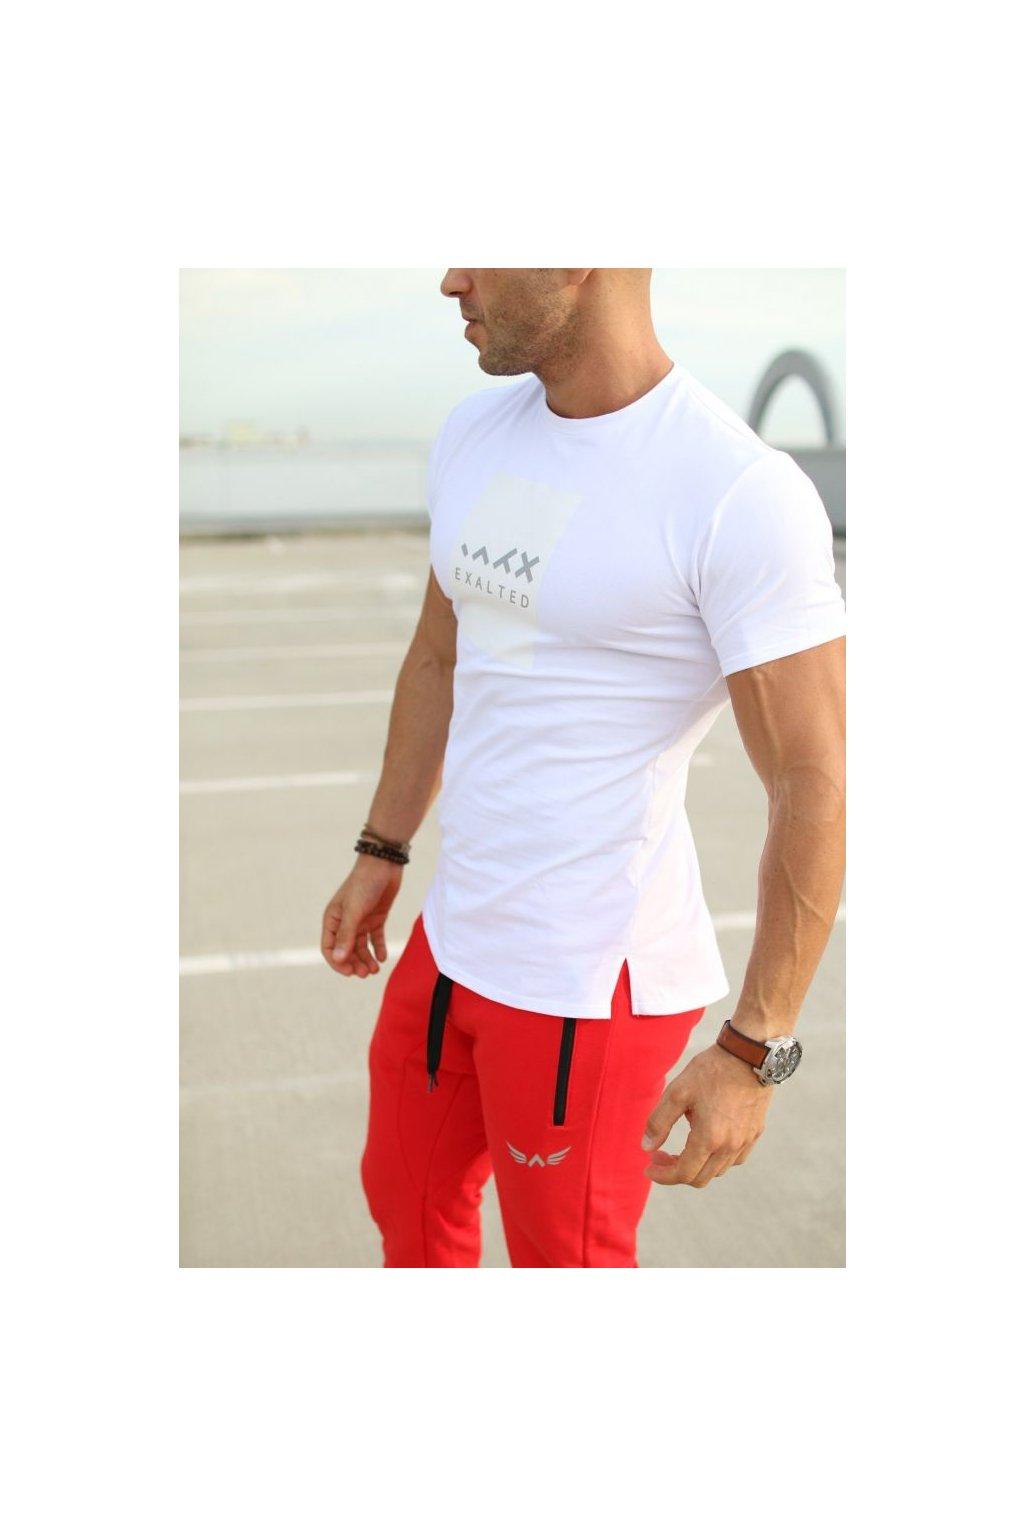 Pánské tričko Exalted E1- Bílé